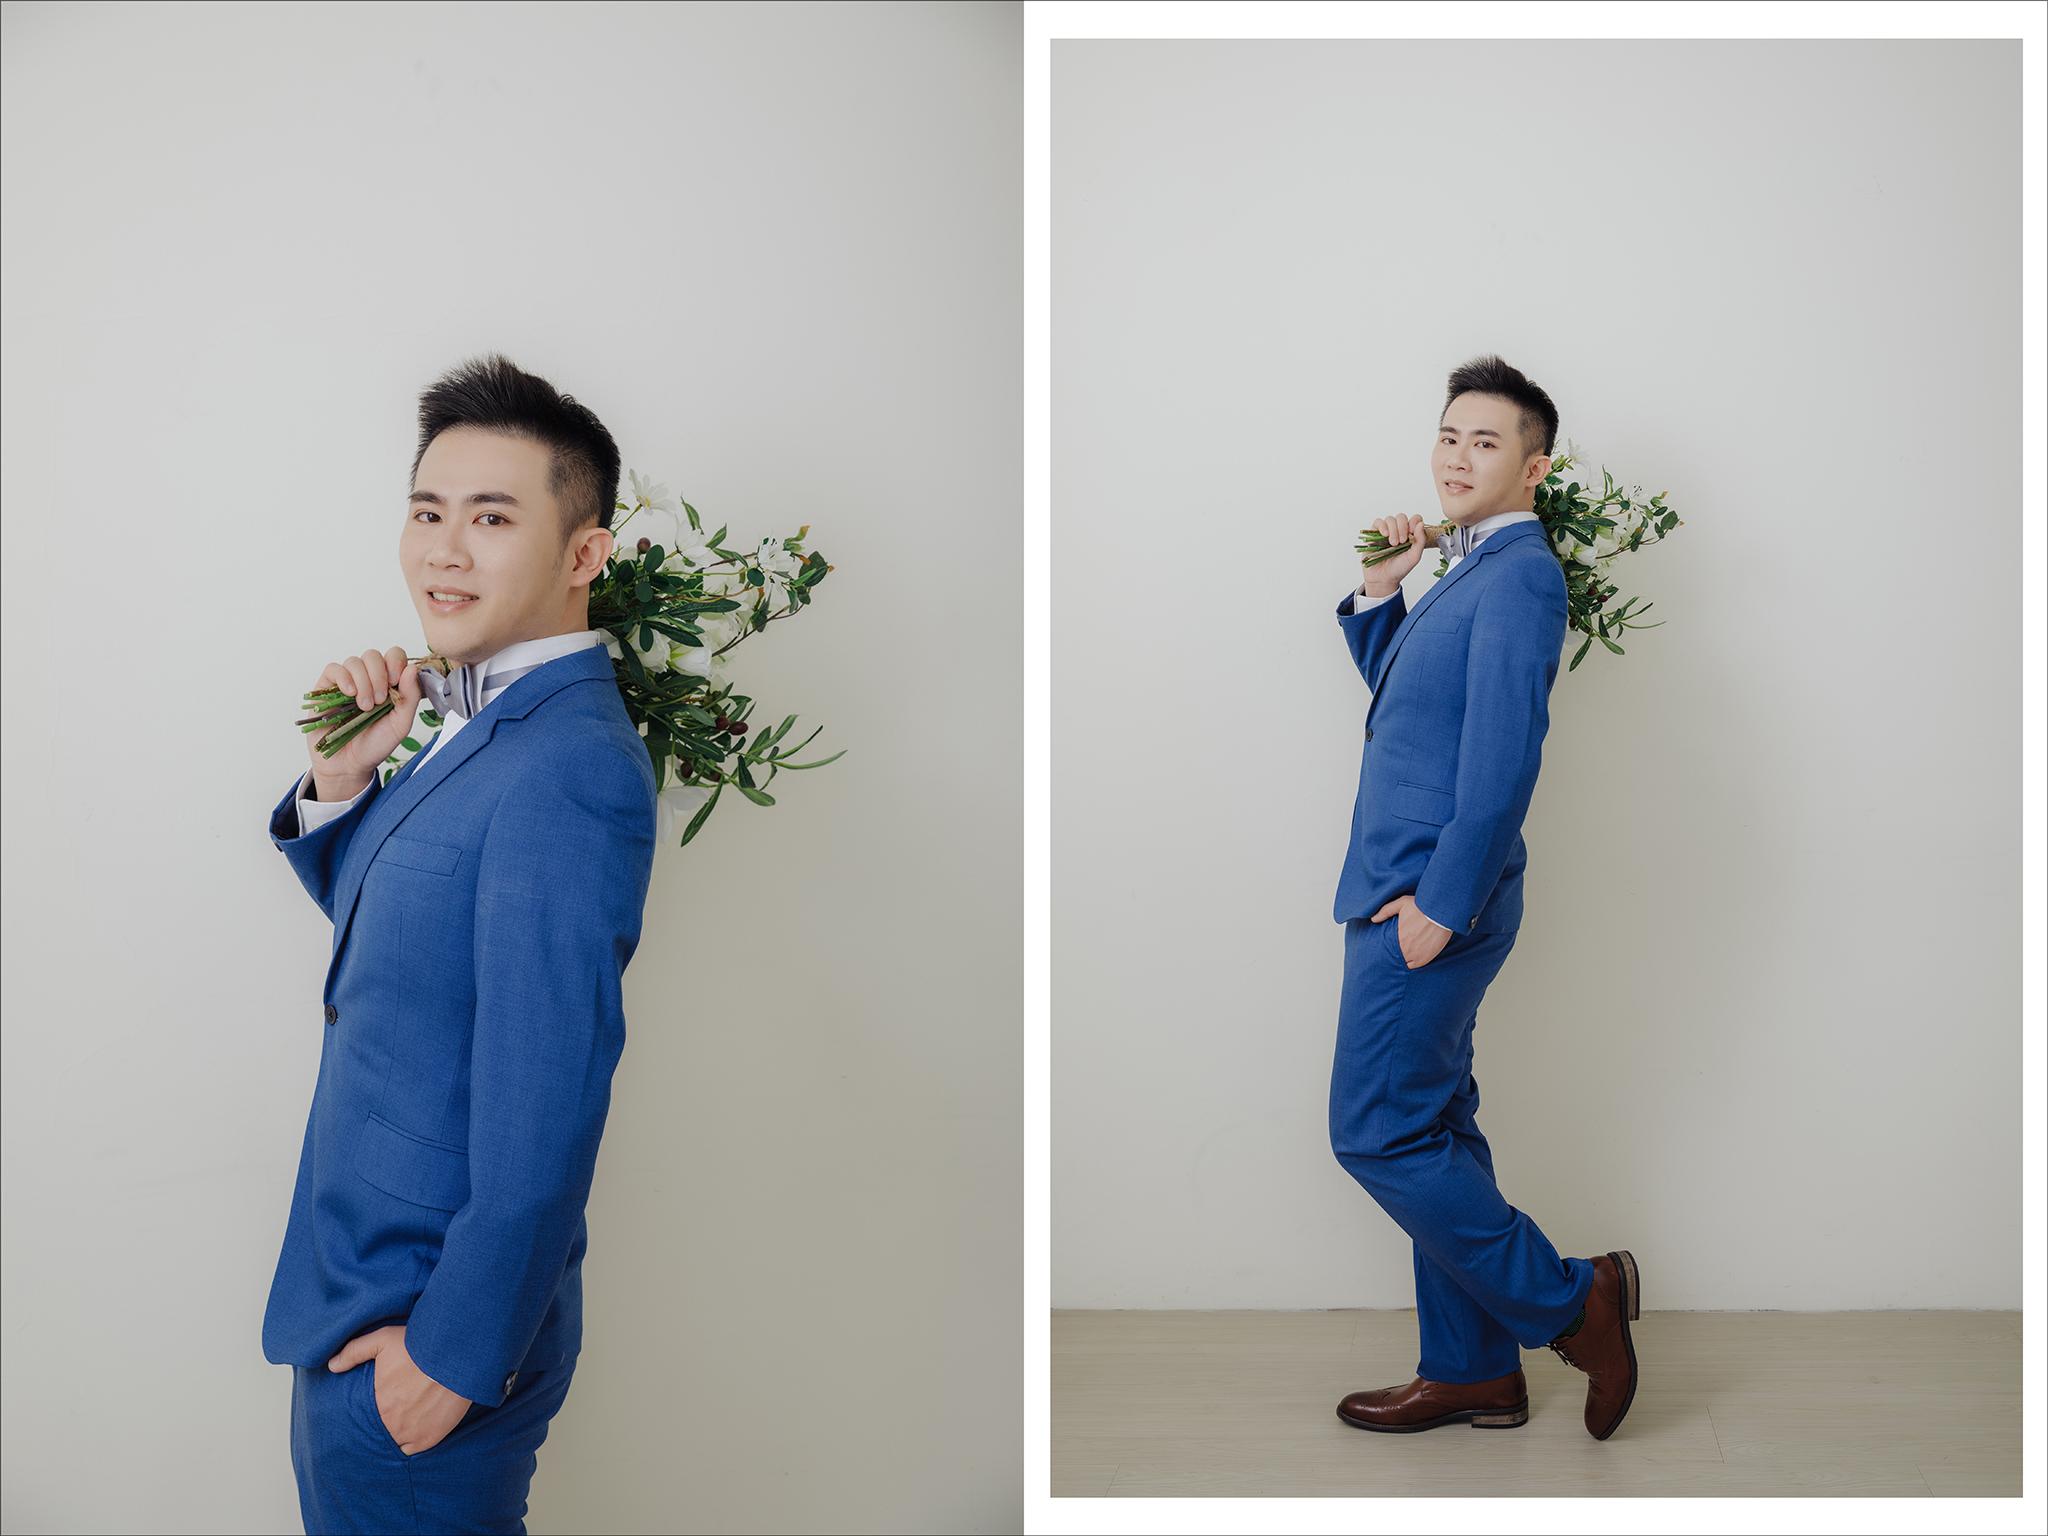 49599268271 d7e4b22df5 o - 【自助婚紗】+啟安&虹虹+